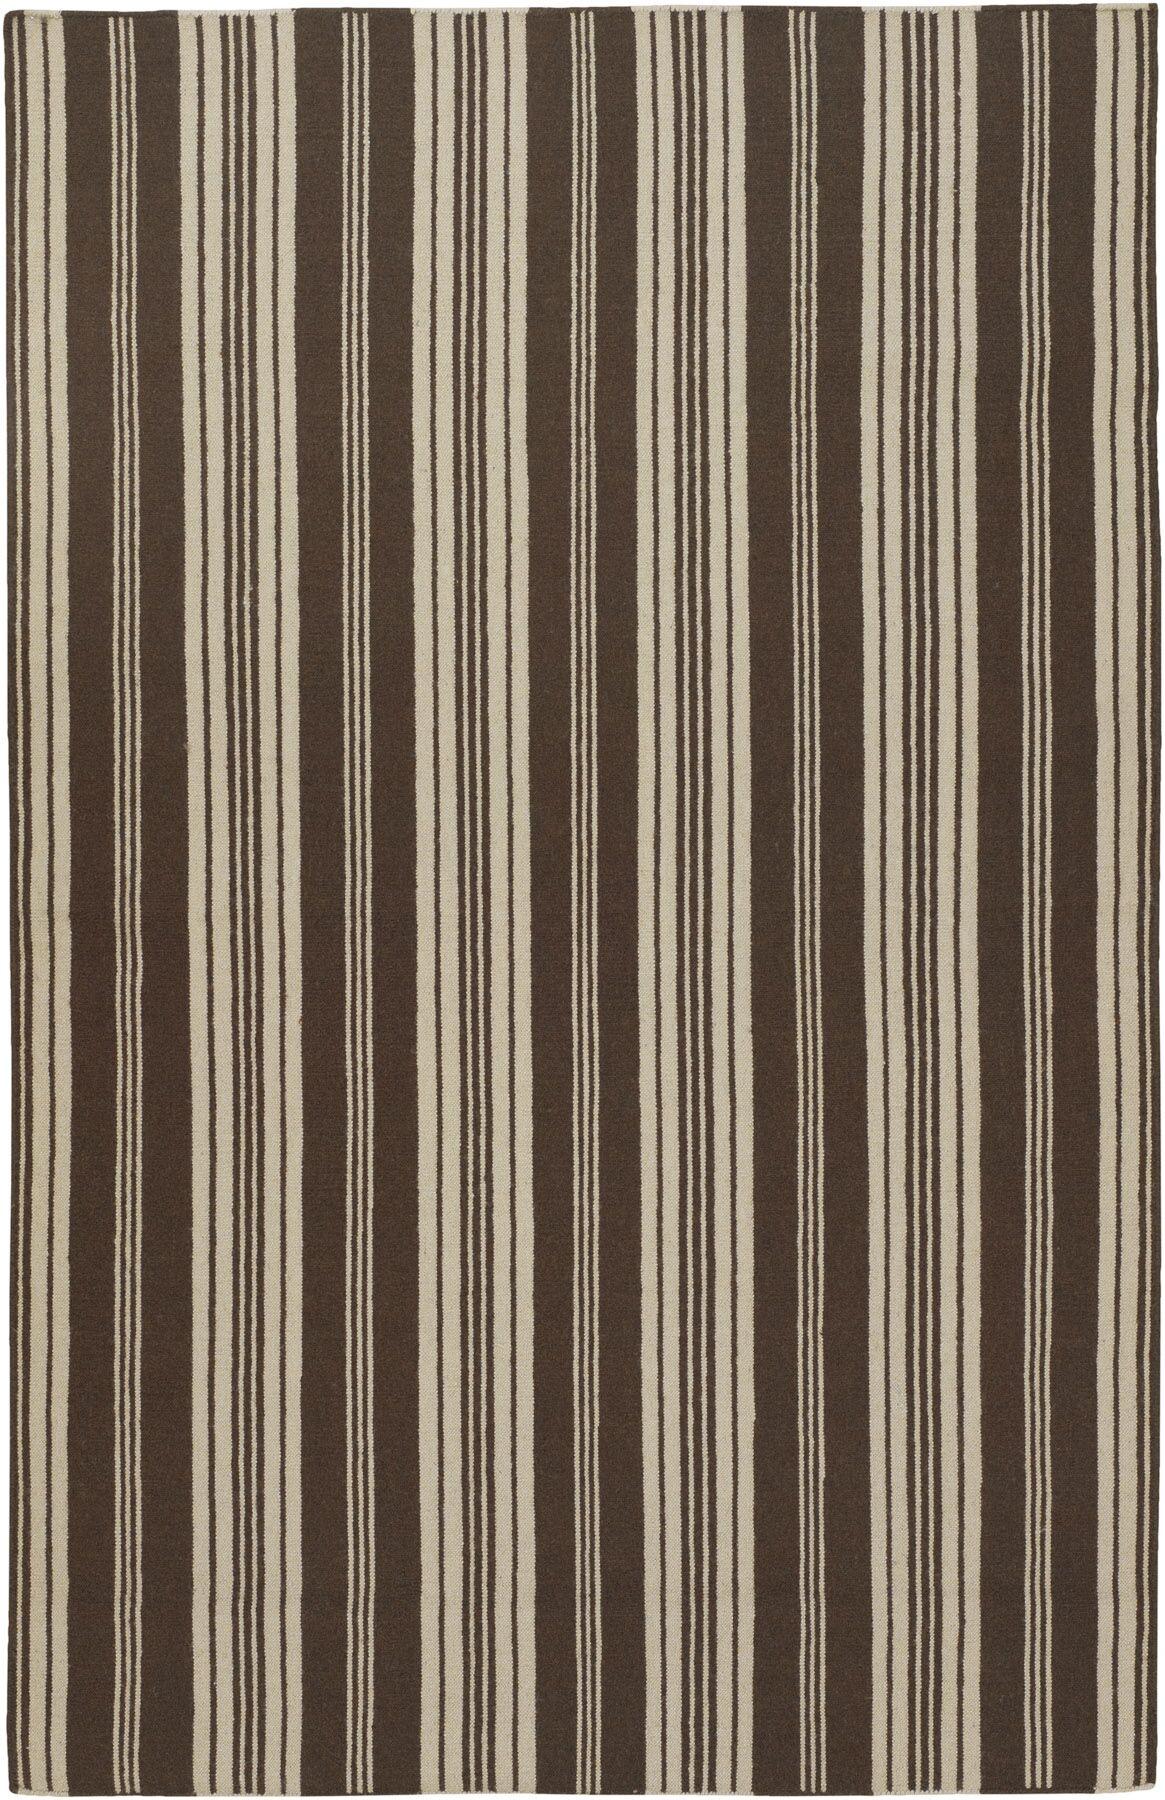 Farmhouse Stripes Hand-Woven Brown/Tan Area Rug Rug Size: Rectangle 3'6